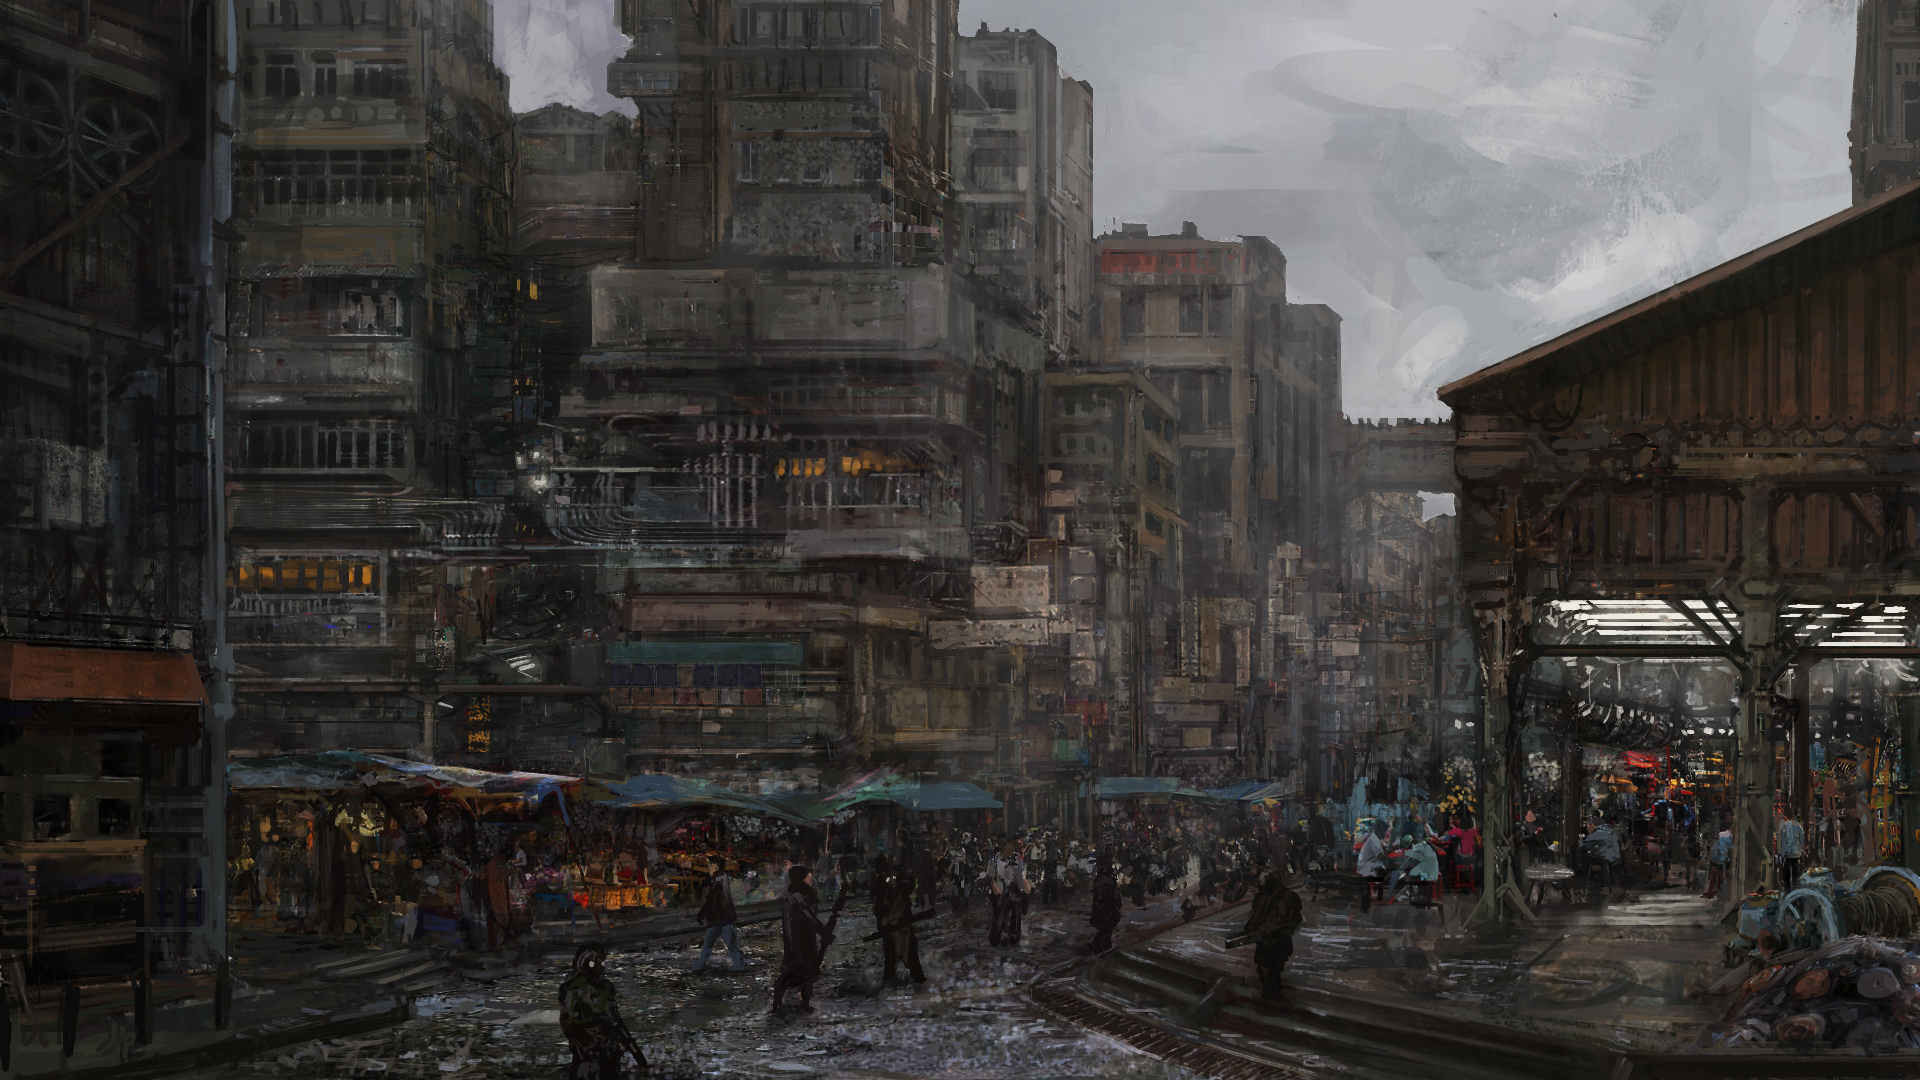 Anime 1920x1080 digital futuristic city broken rain trash pollution crow digital painting